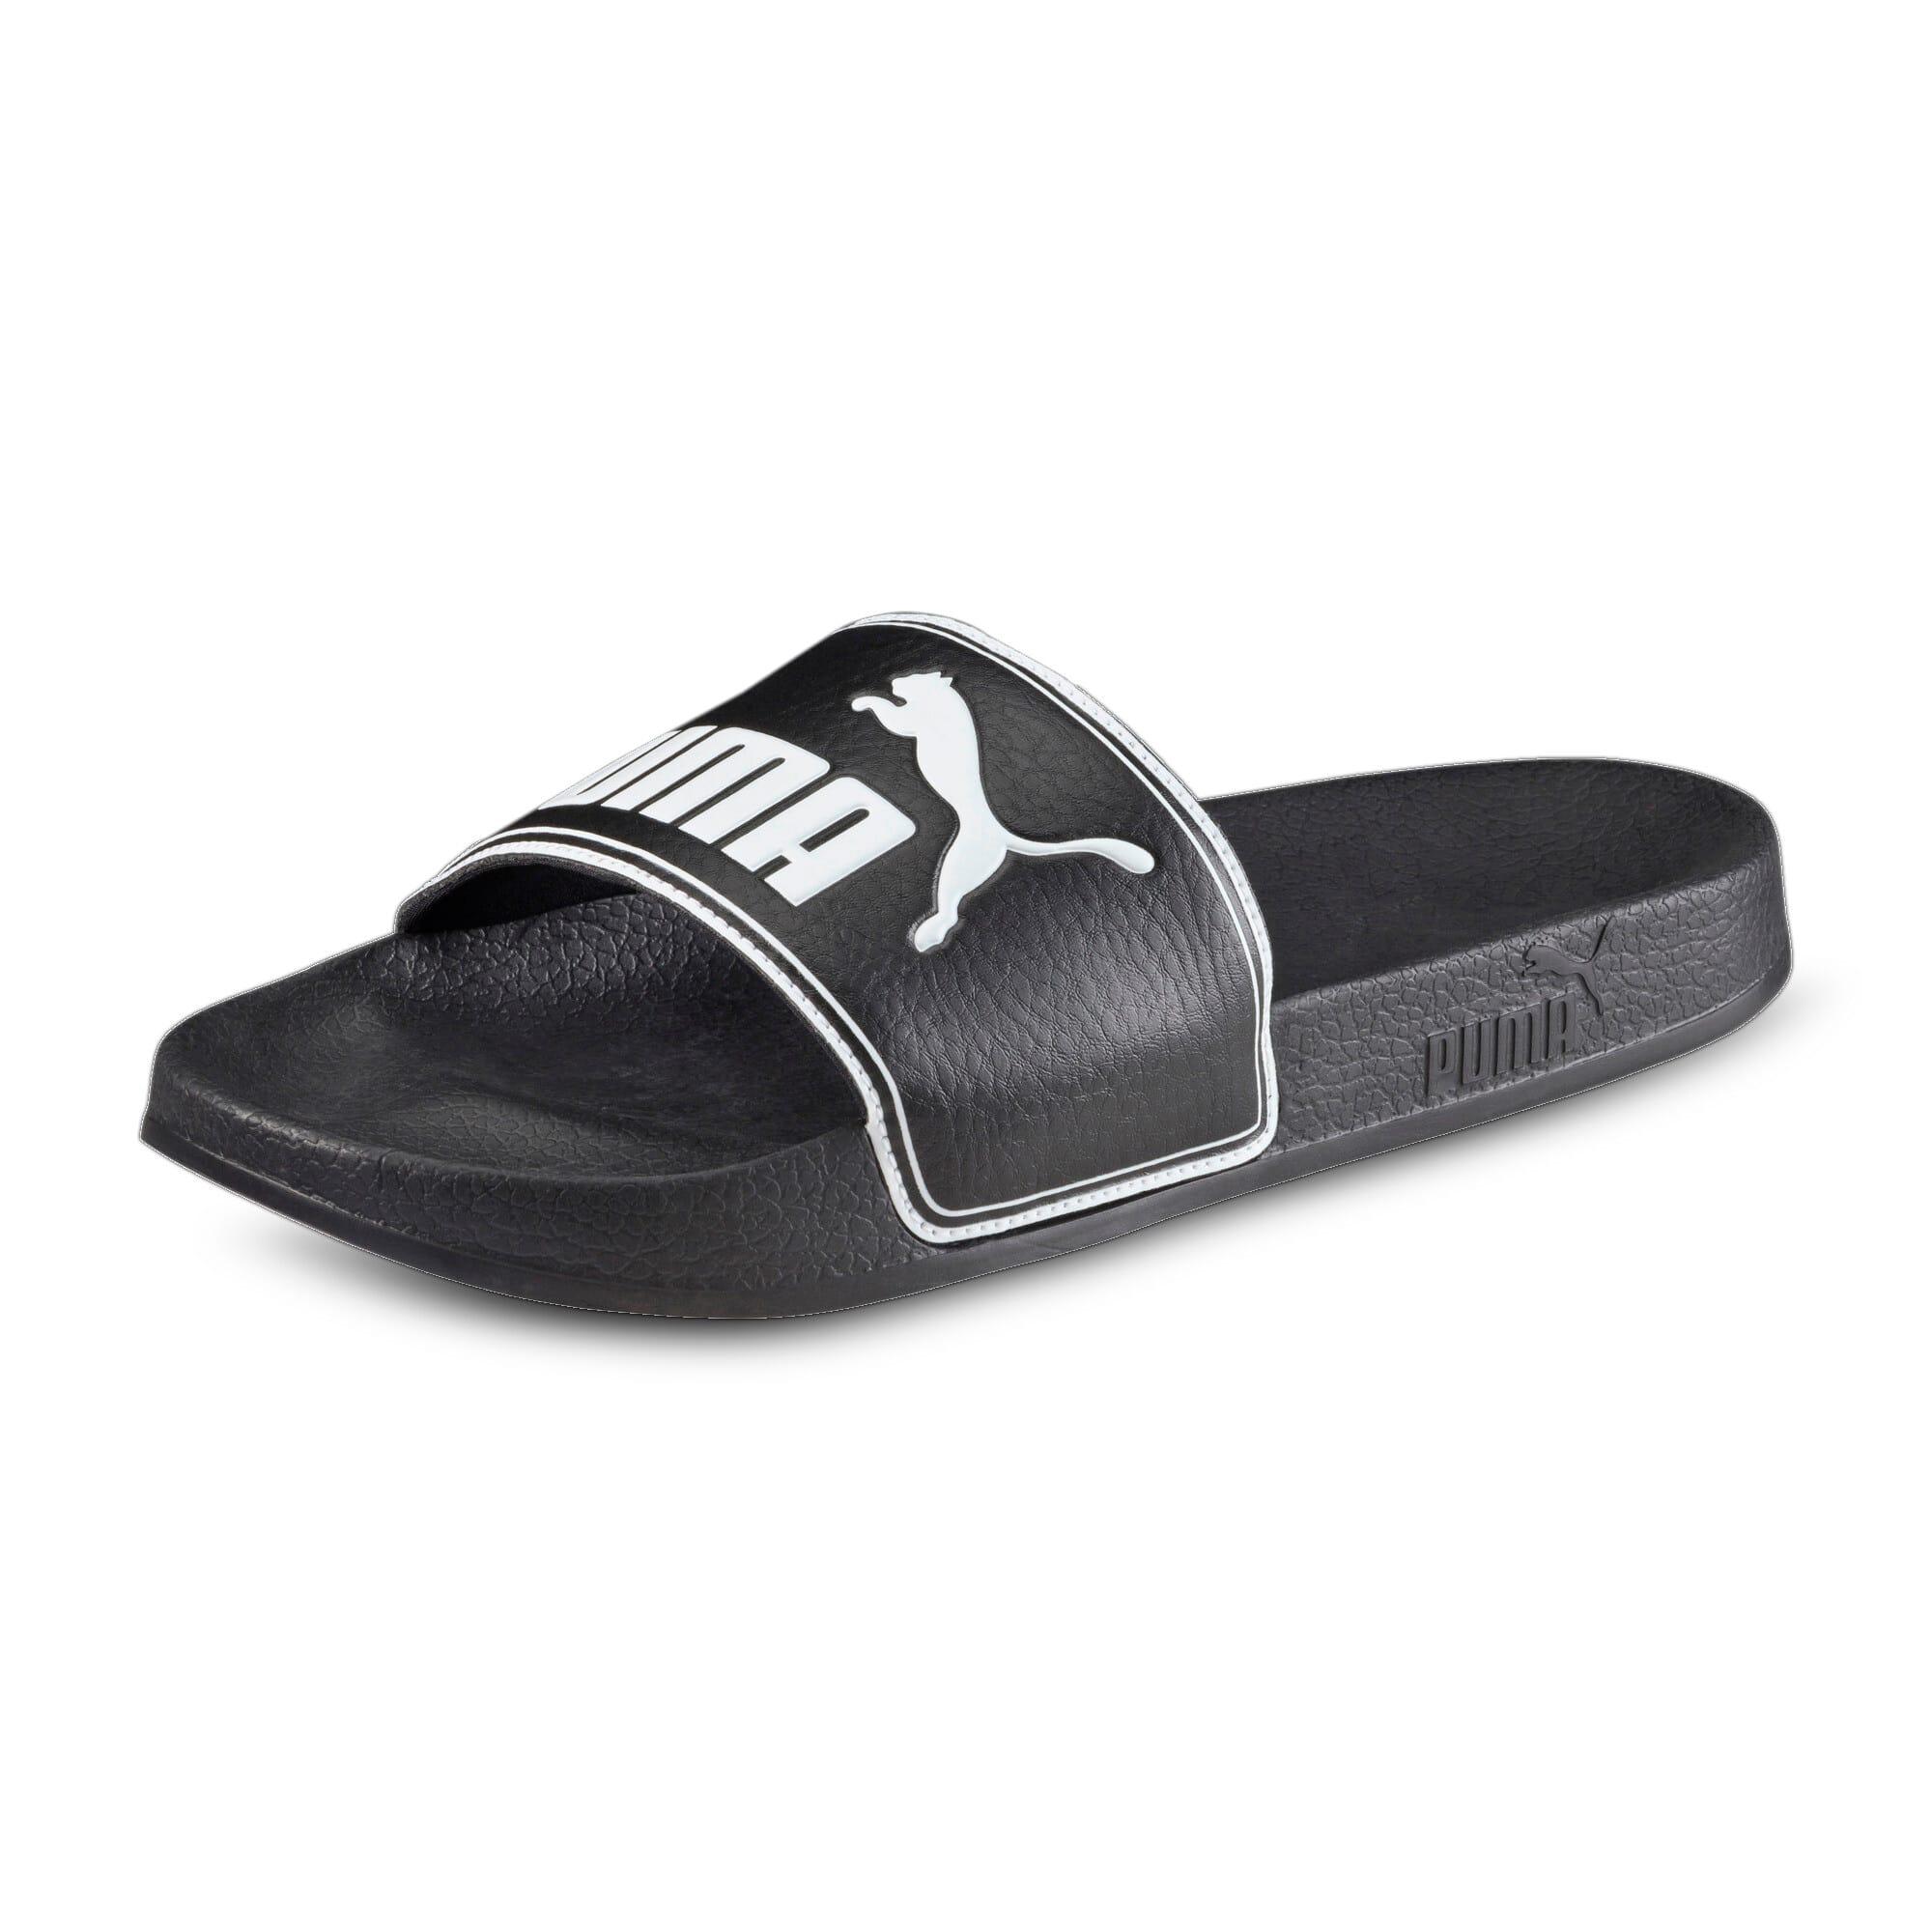 Thumbnail 1 of Leadcat Sandals, black-white, medium-IND